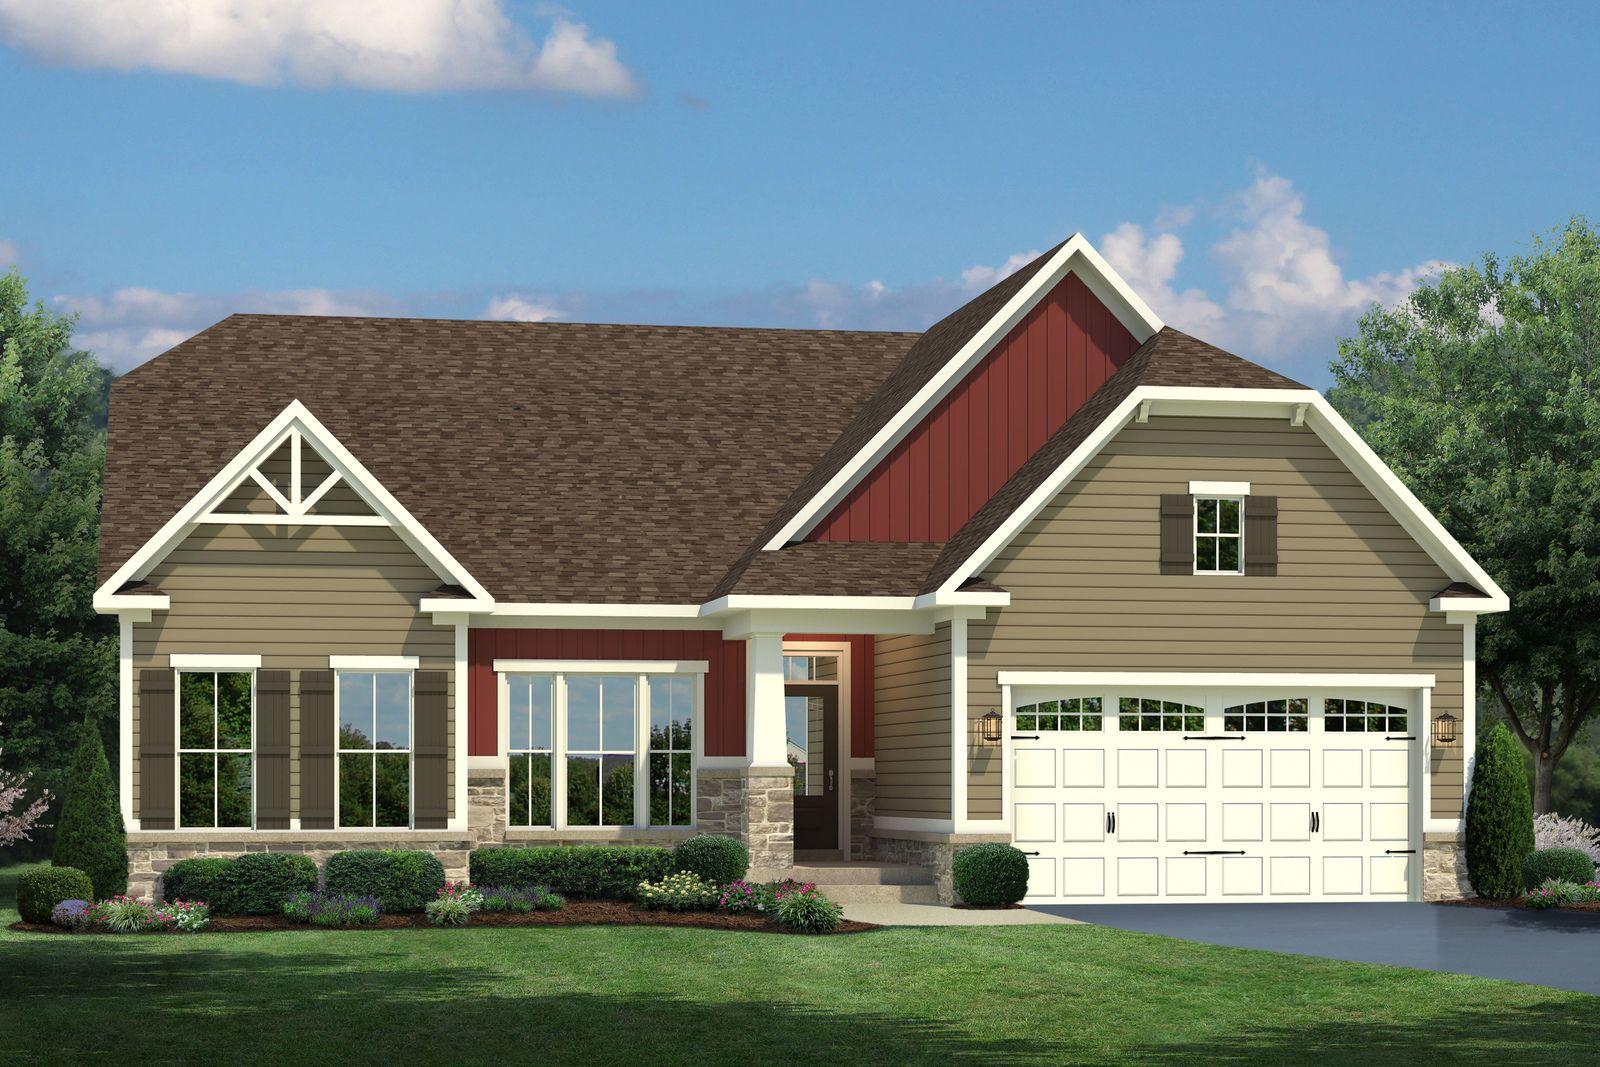 188 Kaitlyn Drive, Pataskala, OH Homes & Land - Real Estate